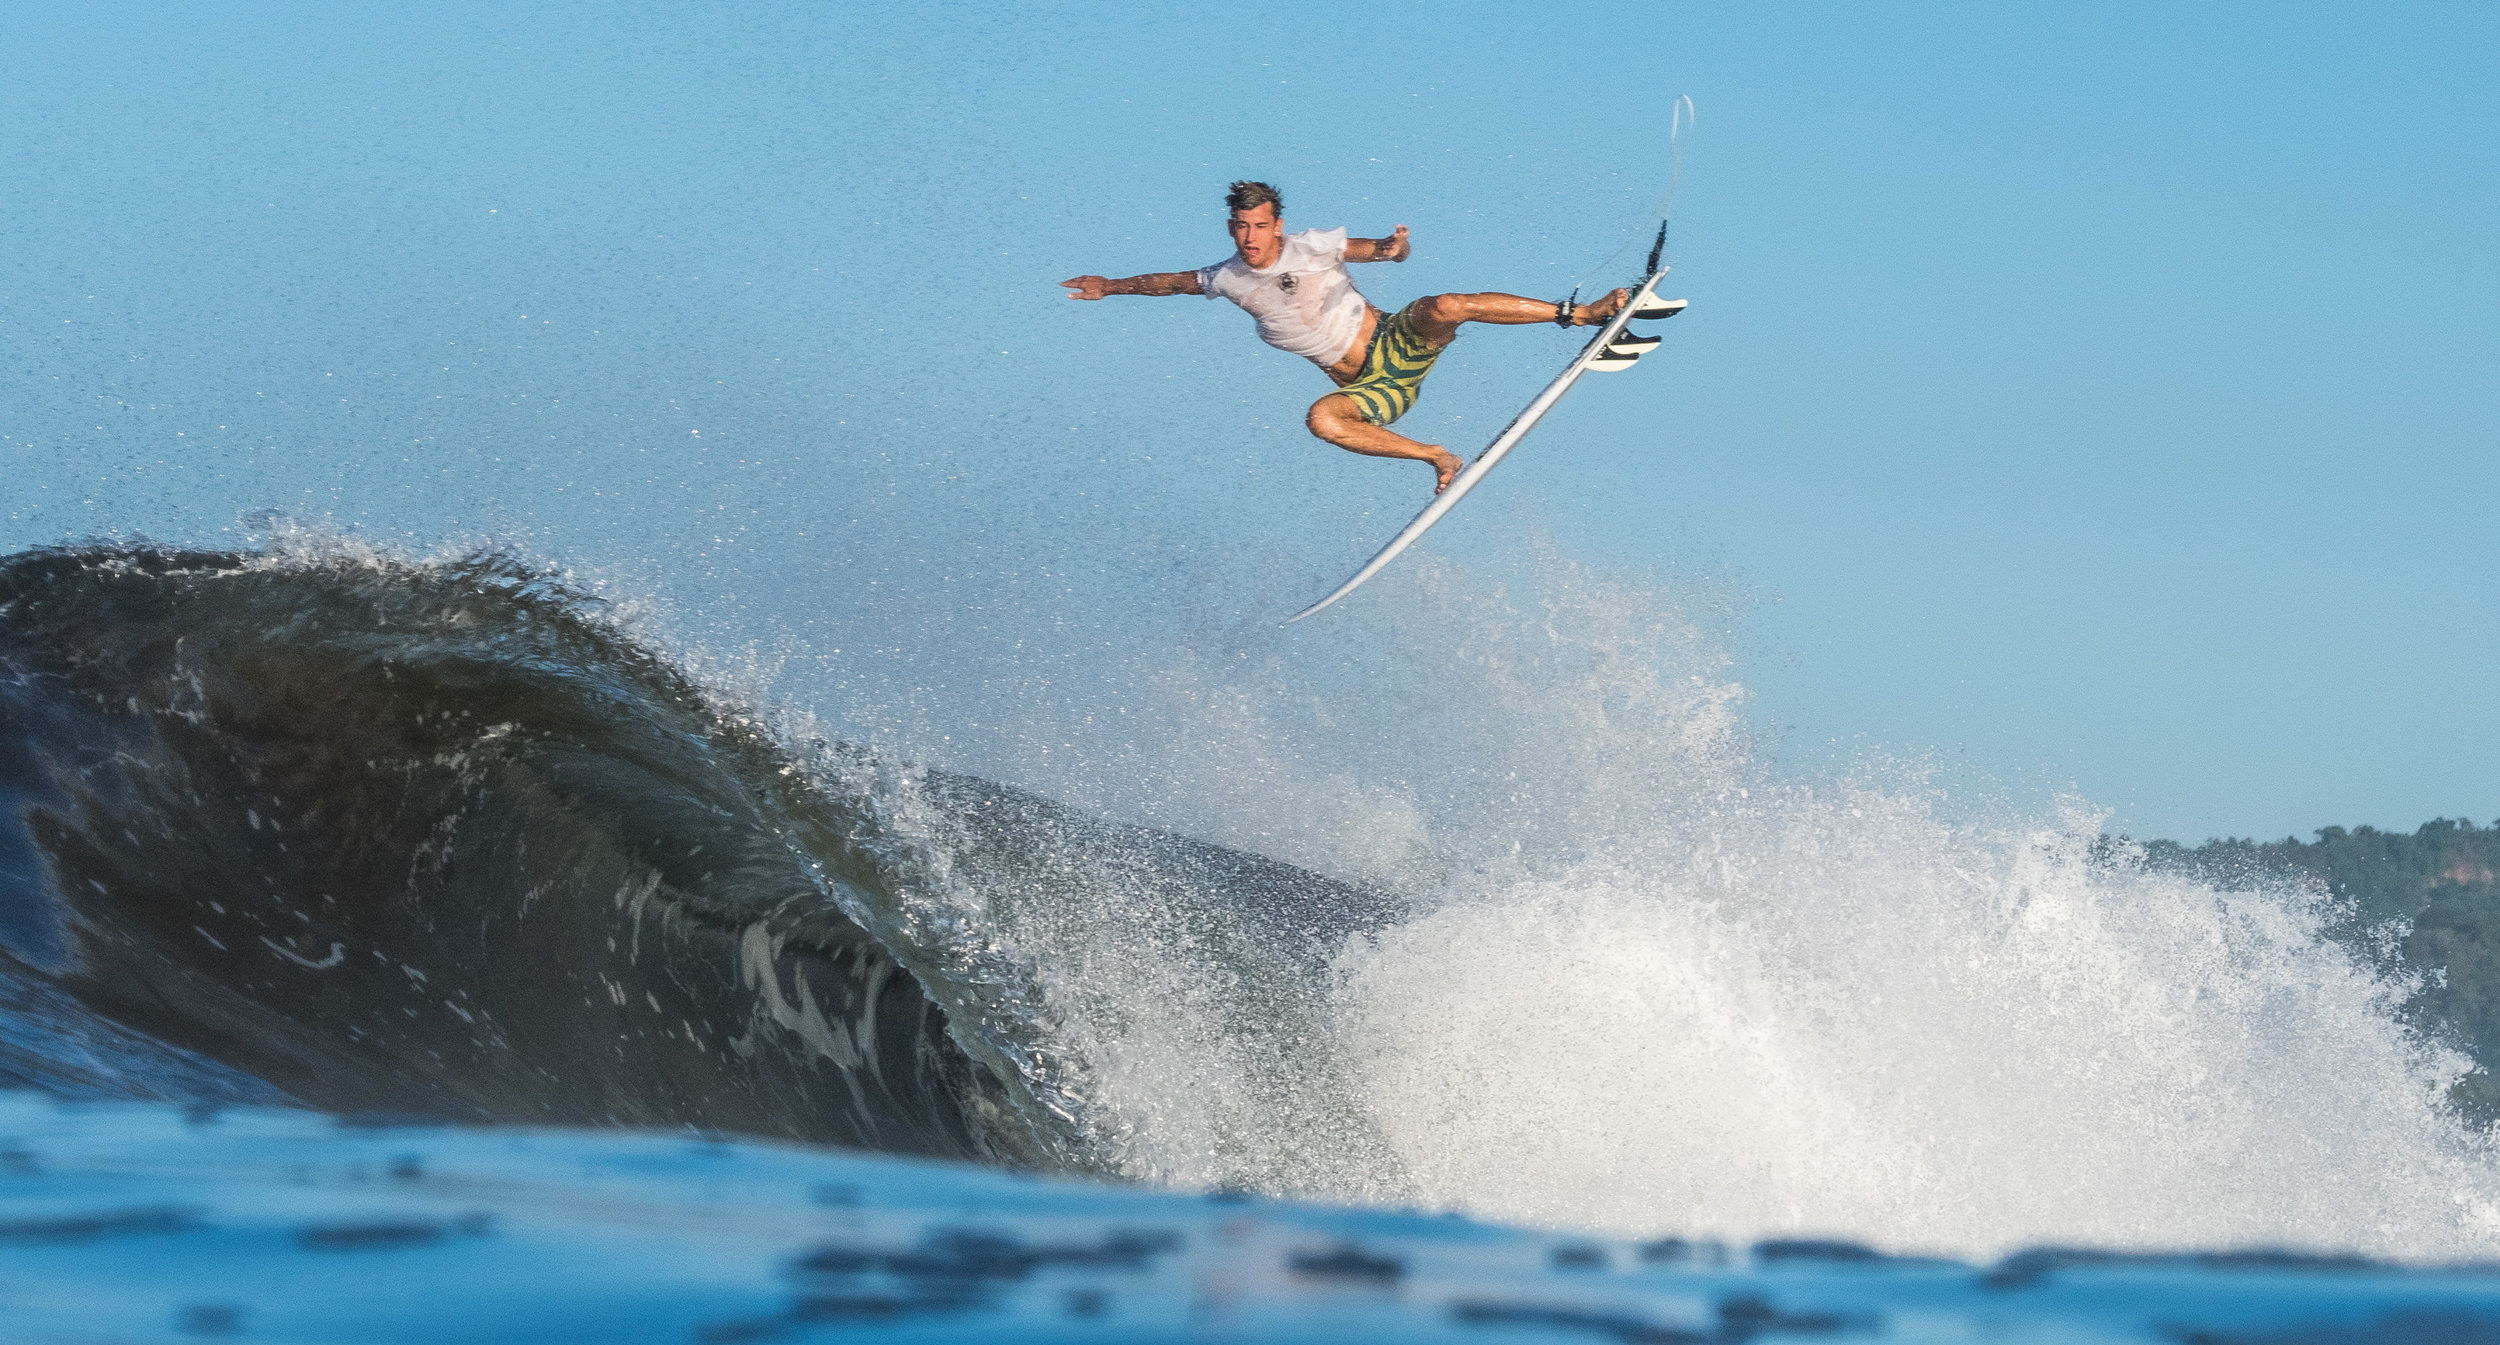 Leon Glatzer en playa Hermosa / Costa Rica  Fuji XT-2 / 90mm f2